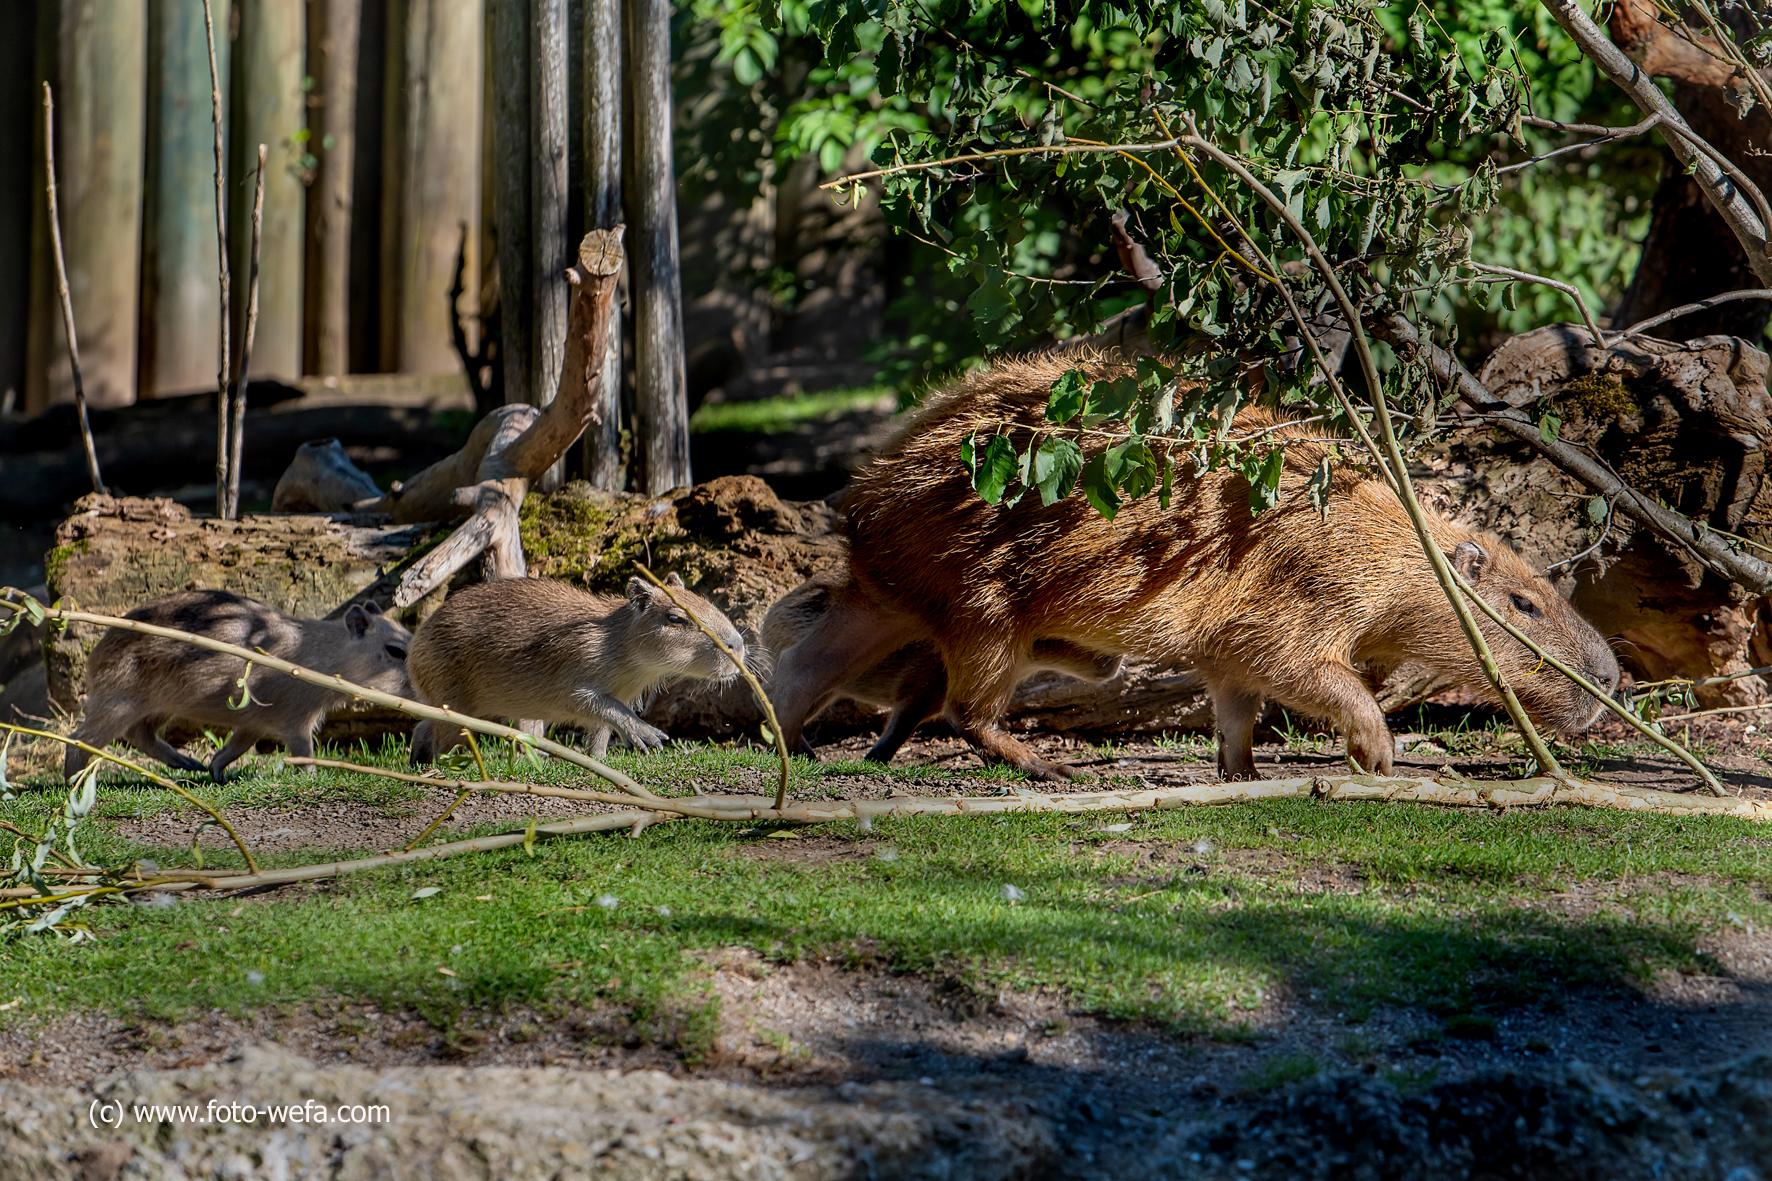 Capybara____Meer-Schwein_Zoo_Zürich_09.